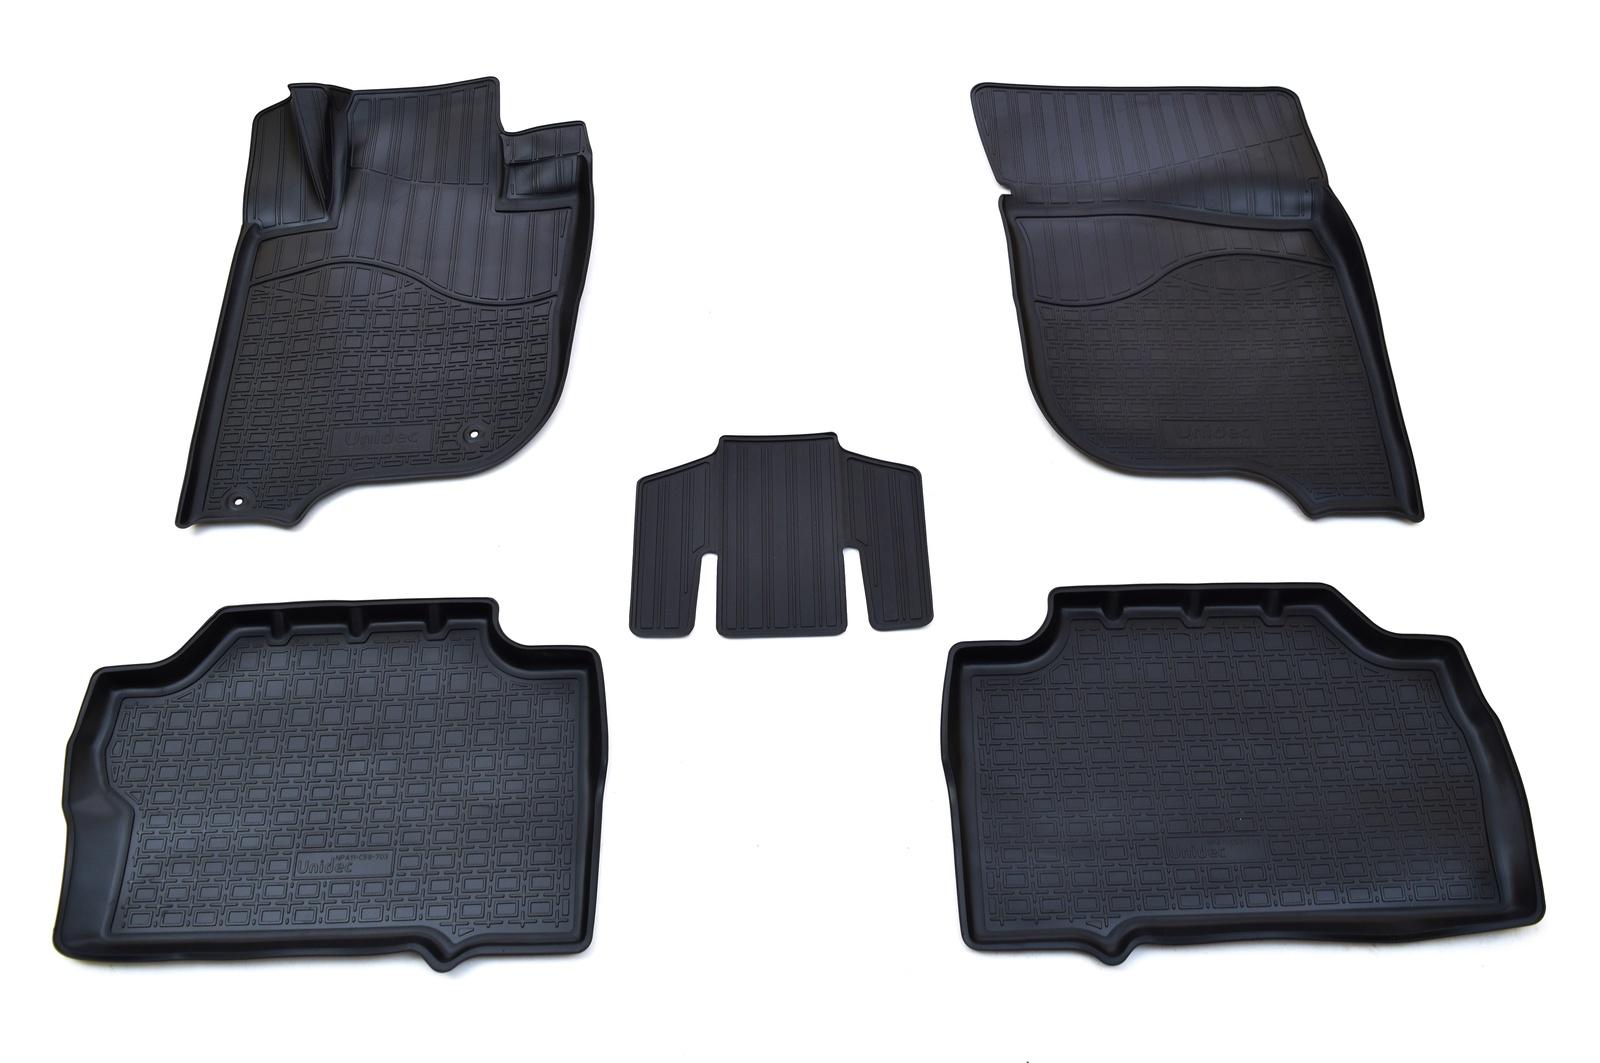 Коврики в салон автомобиля Norplast для Mitsubishi Pajero Sport III 3D (2015) (5шт), NPA11-C59-703, черный